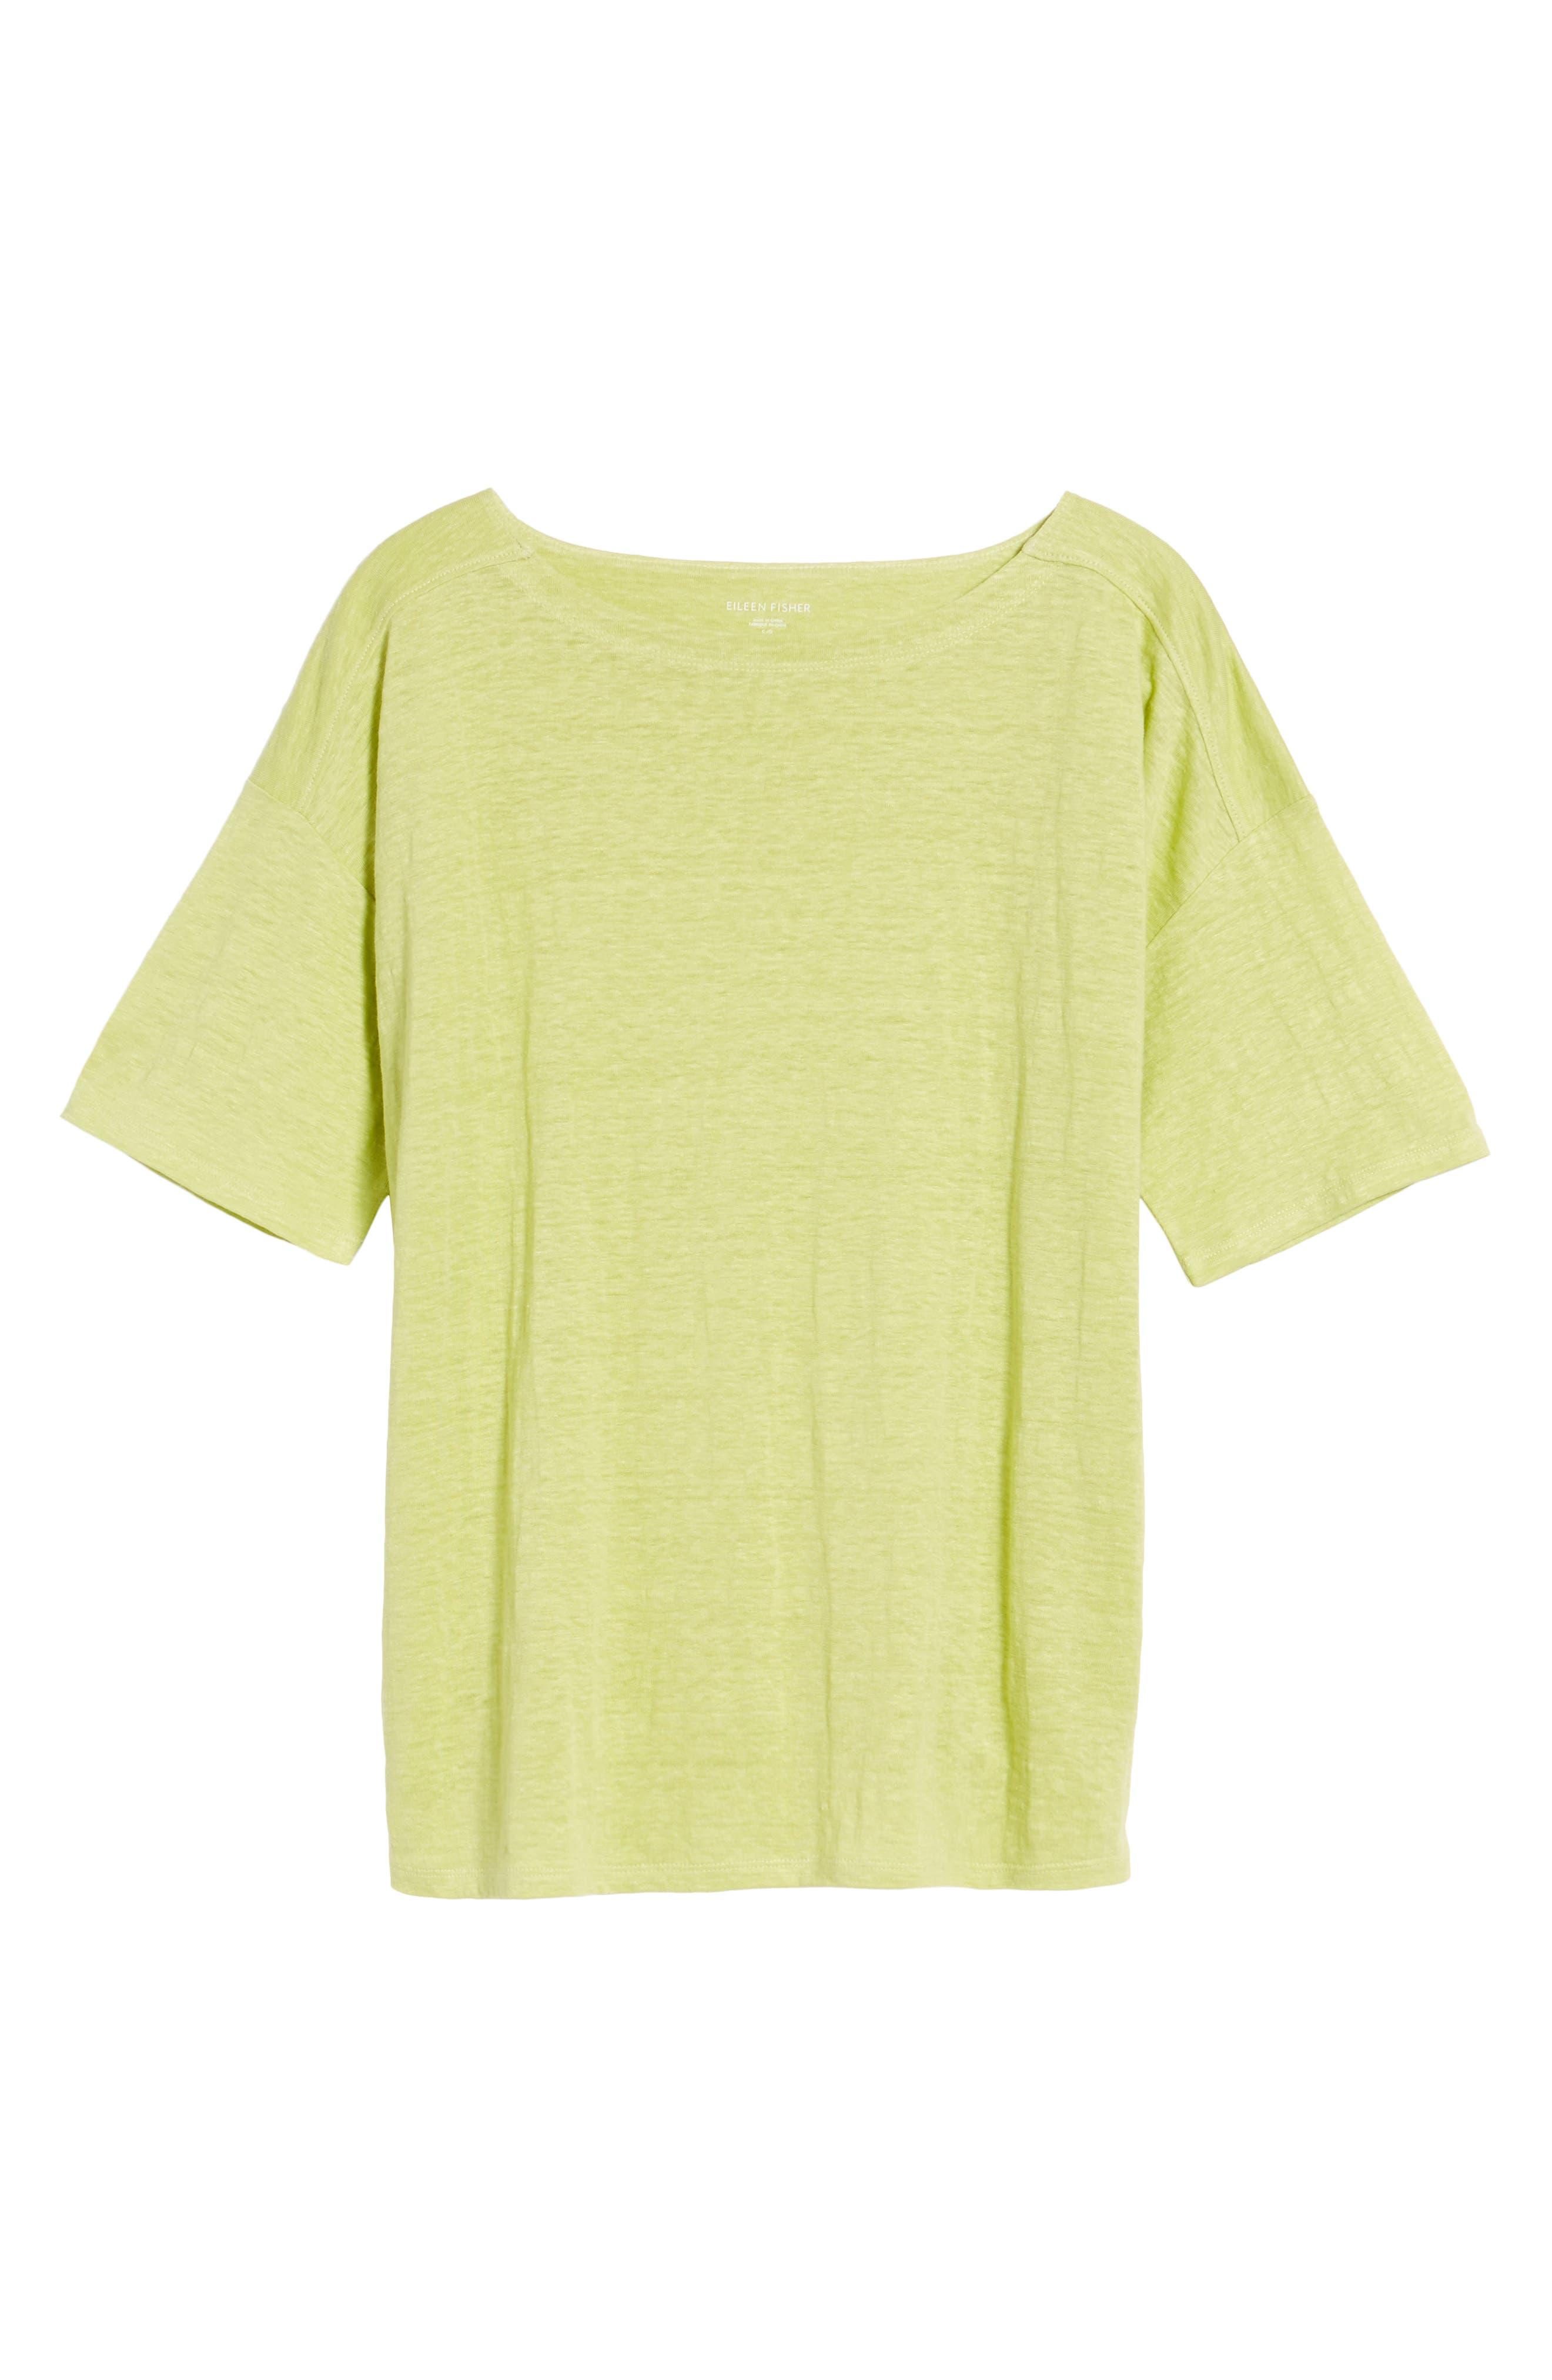 Slouchy Organic Linen Top,                             Alternate thumbnail 35, color,